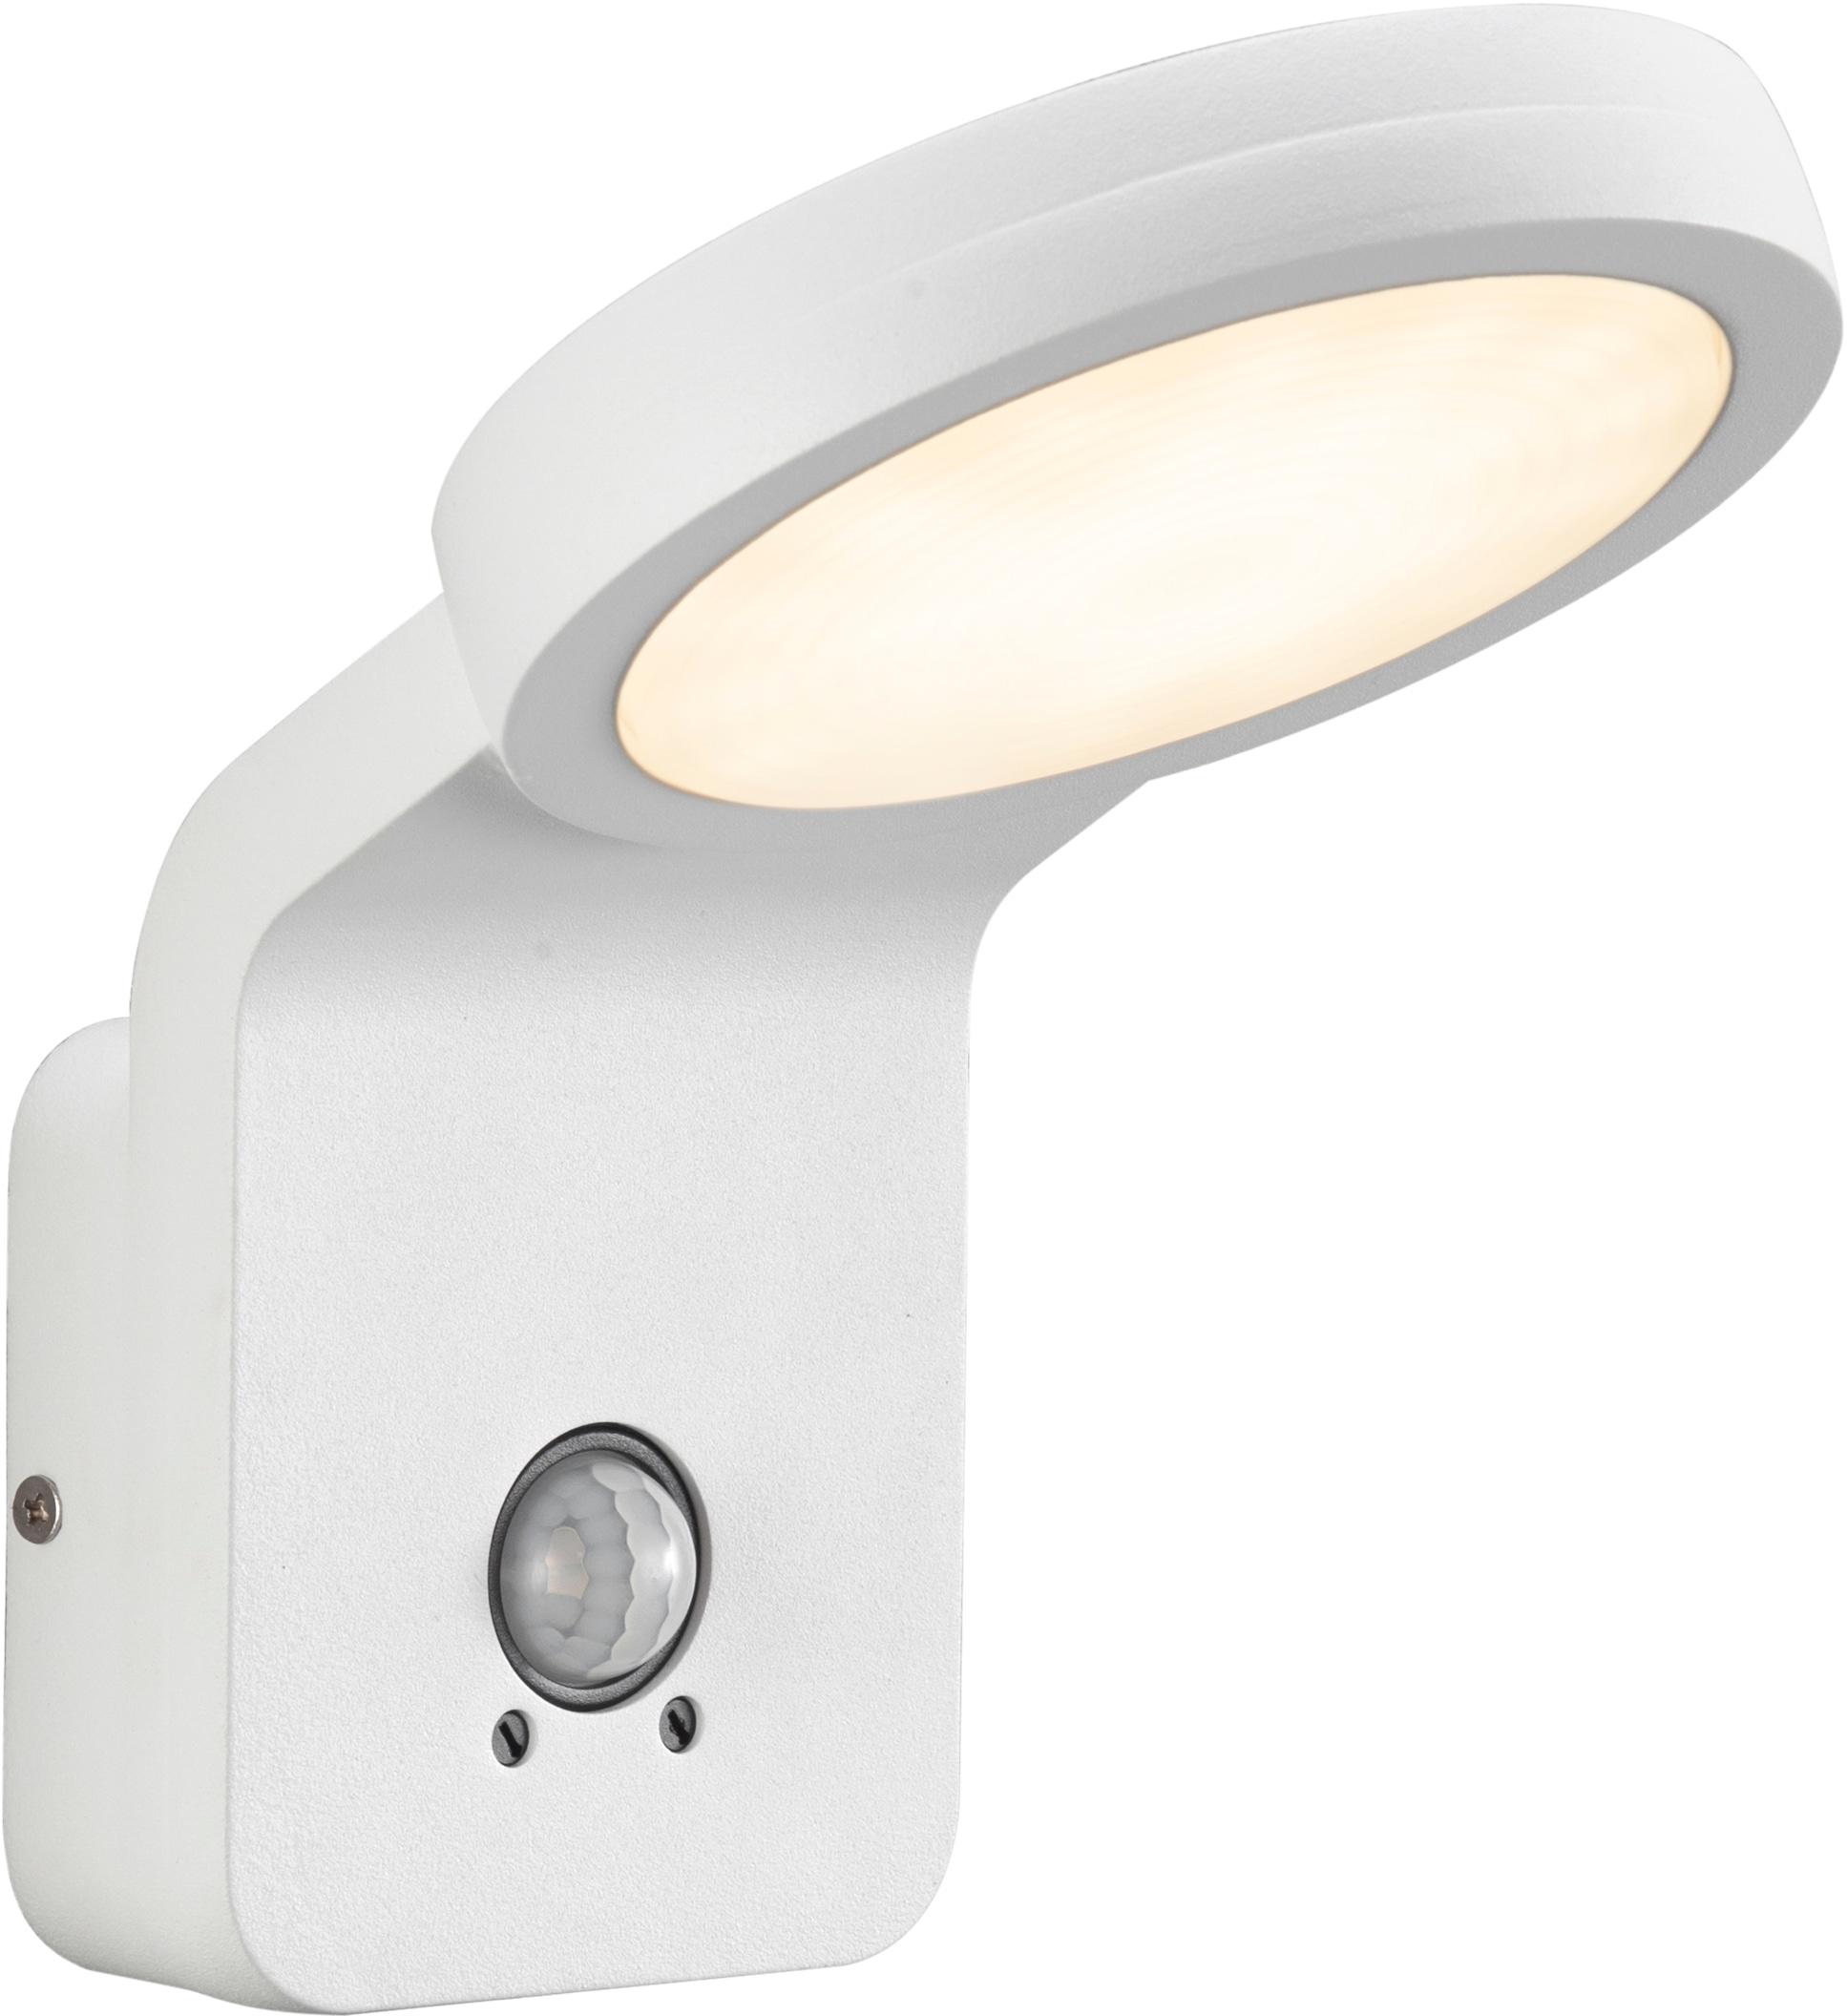 Nordlux,LED Außen-Wandleuchte Marina Flatline Pir Sensor